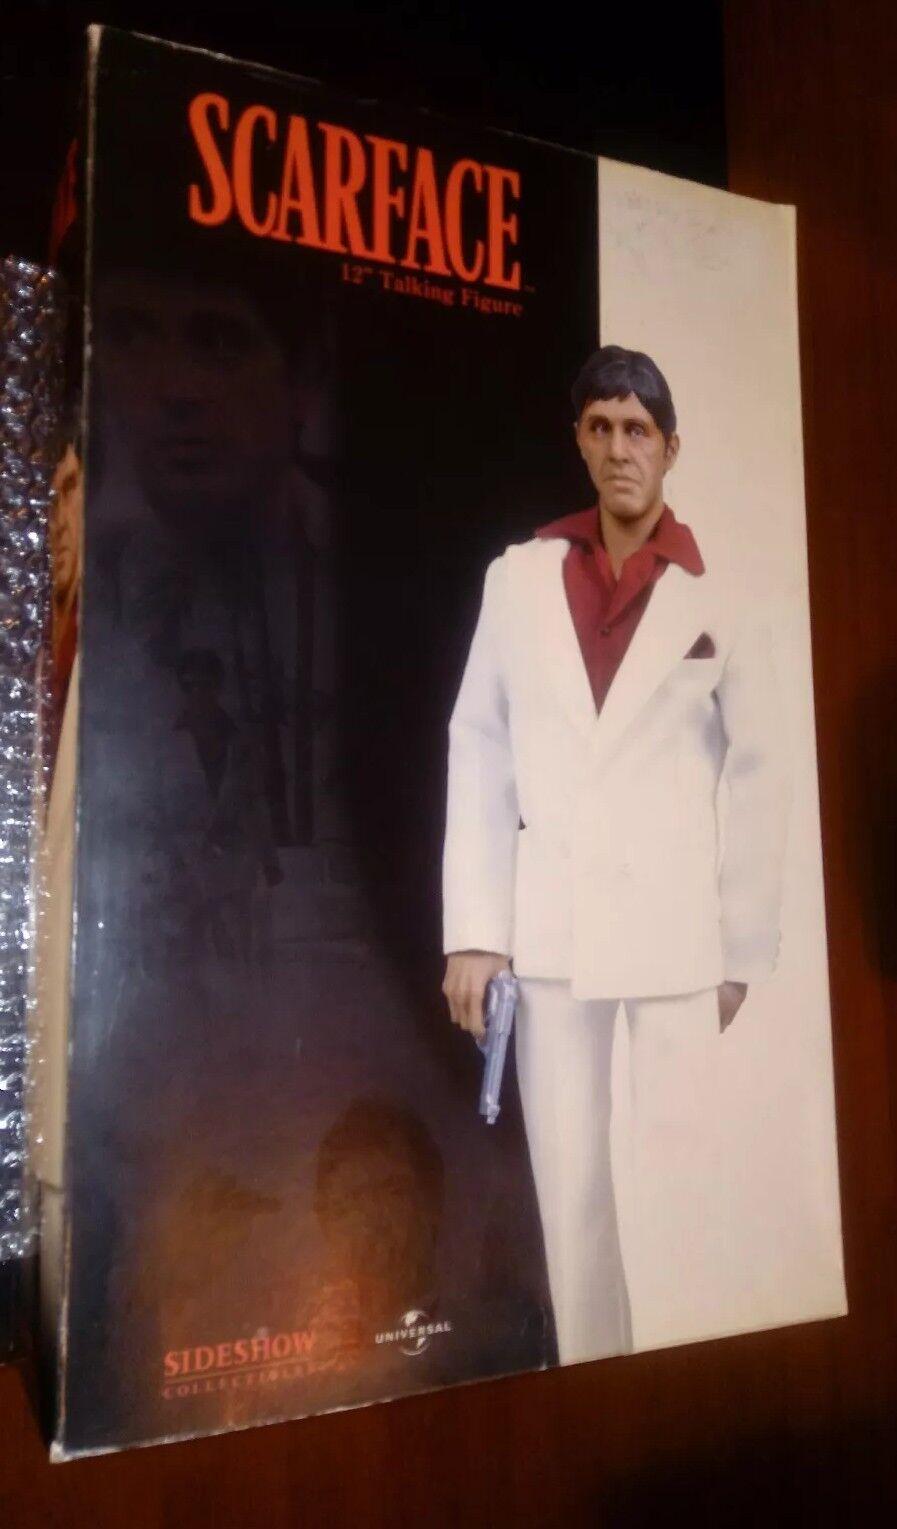 nuevo   Scarface Tony Montana 12 hablando figura Slideshow Collectibles   Rara